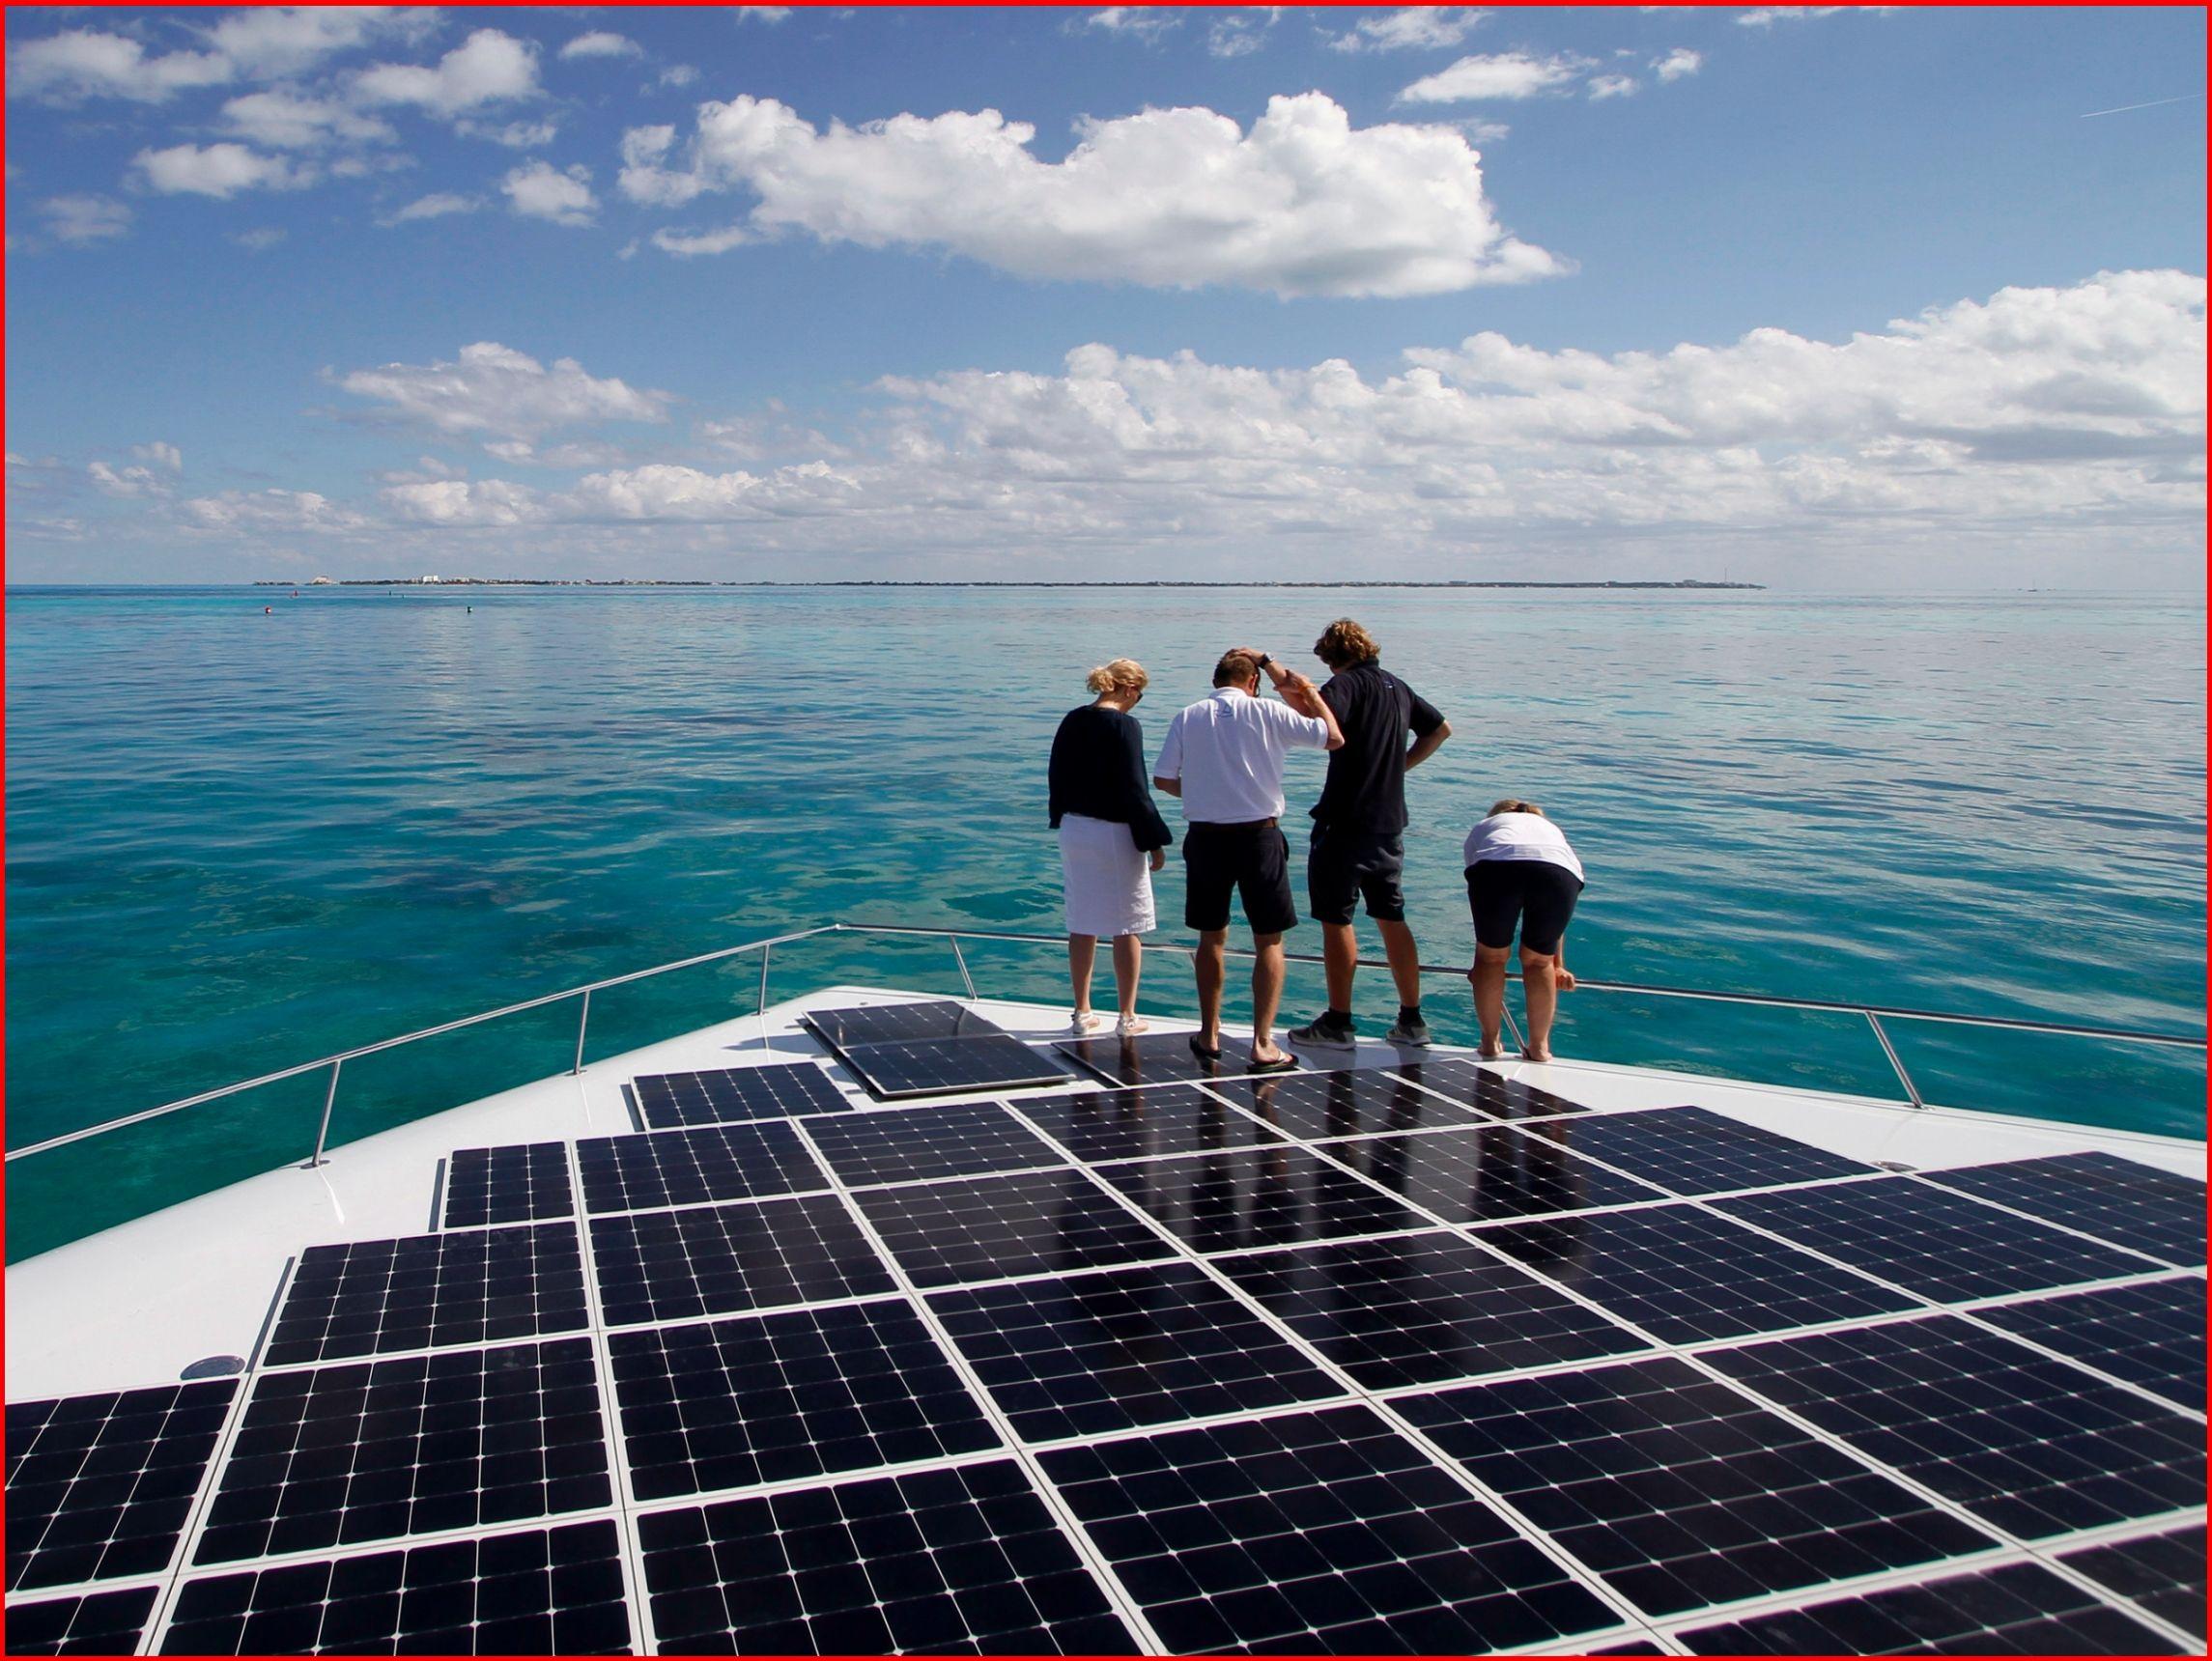 Diy Solar Systems Your Home Renewableenergyisthefuture Solar Panels Solar Solar Roof